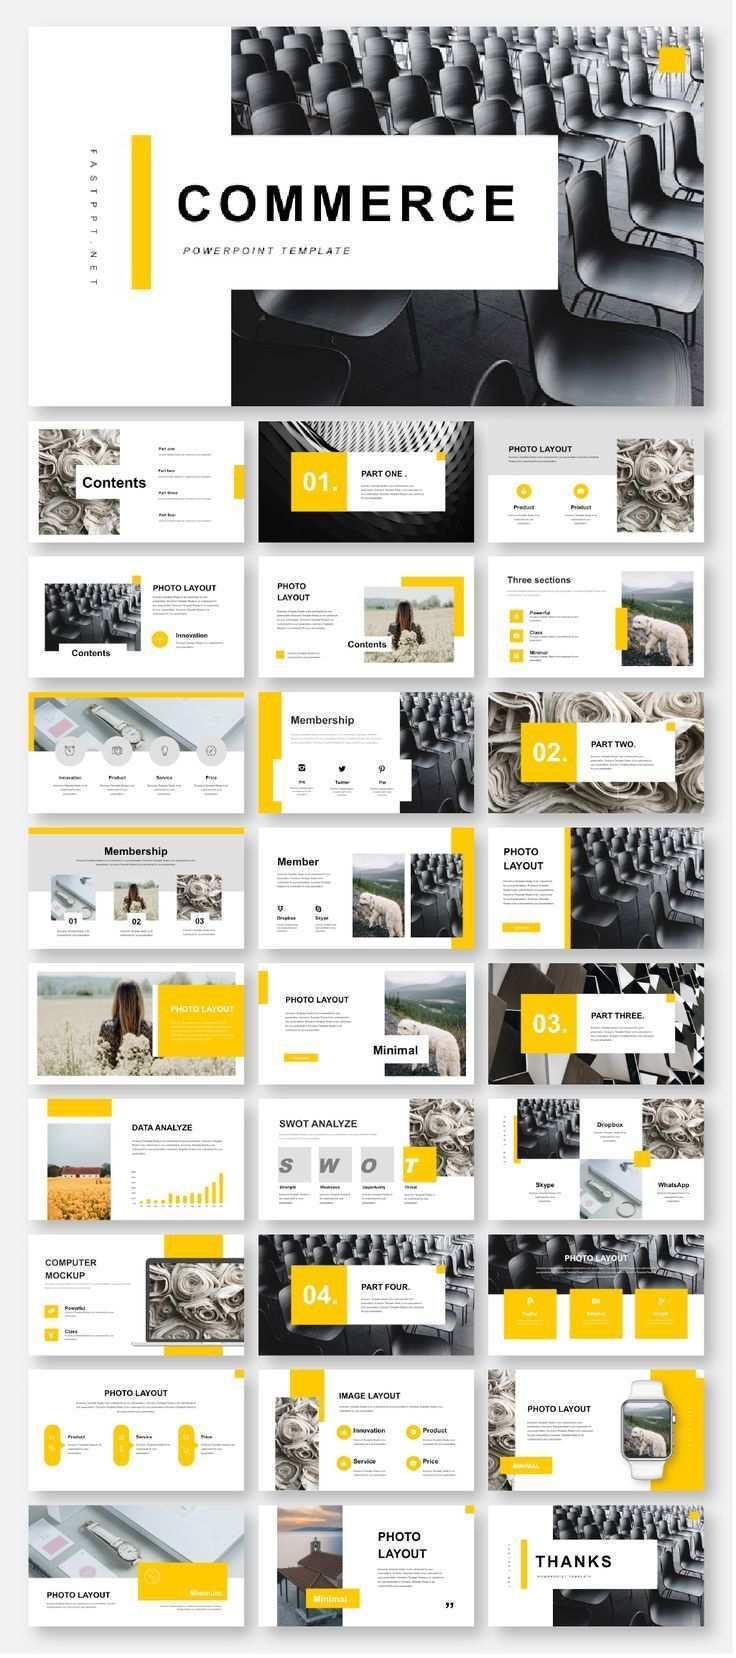 3 In 1 Minimal Creative Professional Powerpoint Template V 2020 G Dizajn Kataloga Produkcii Shablony Dizajna Broshyury Shablony Power Point